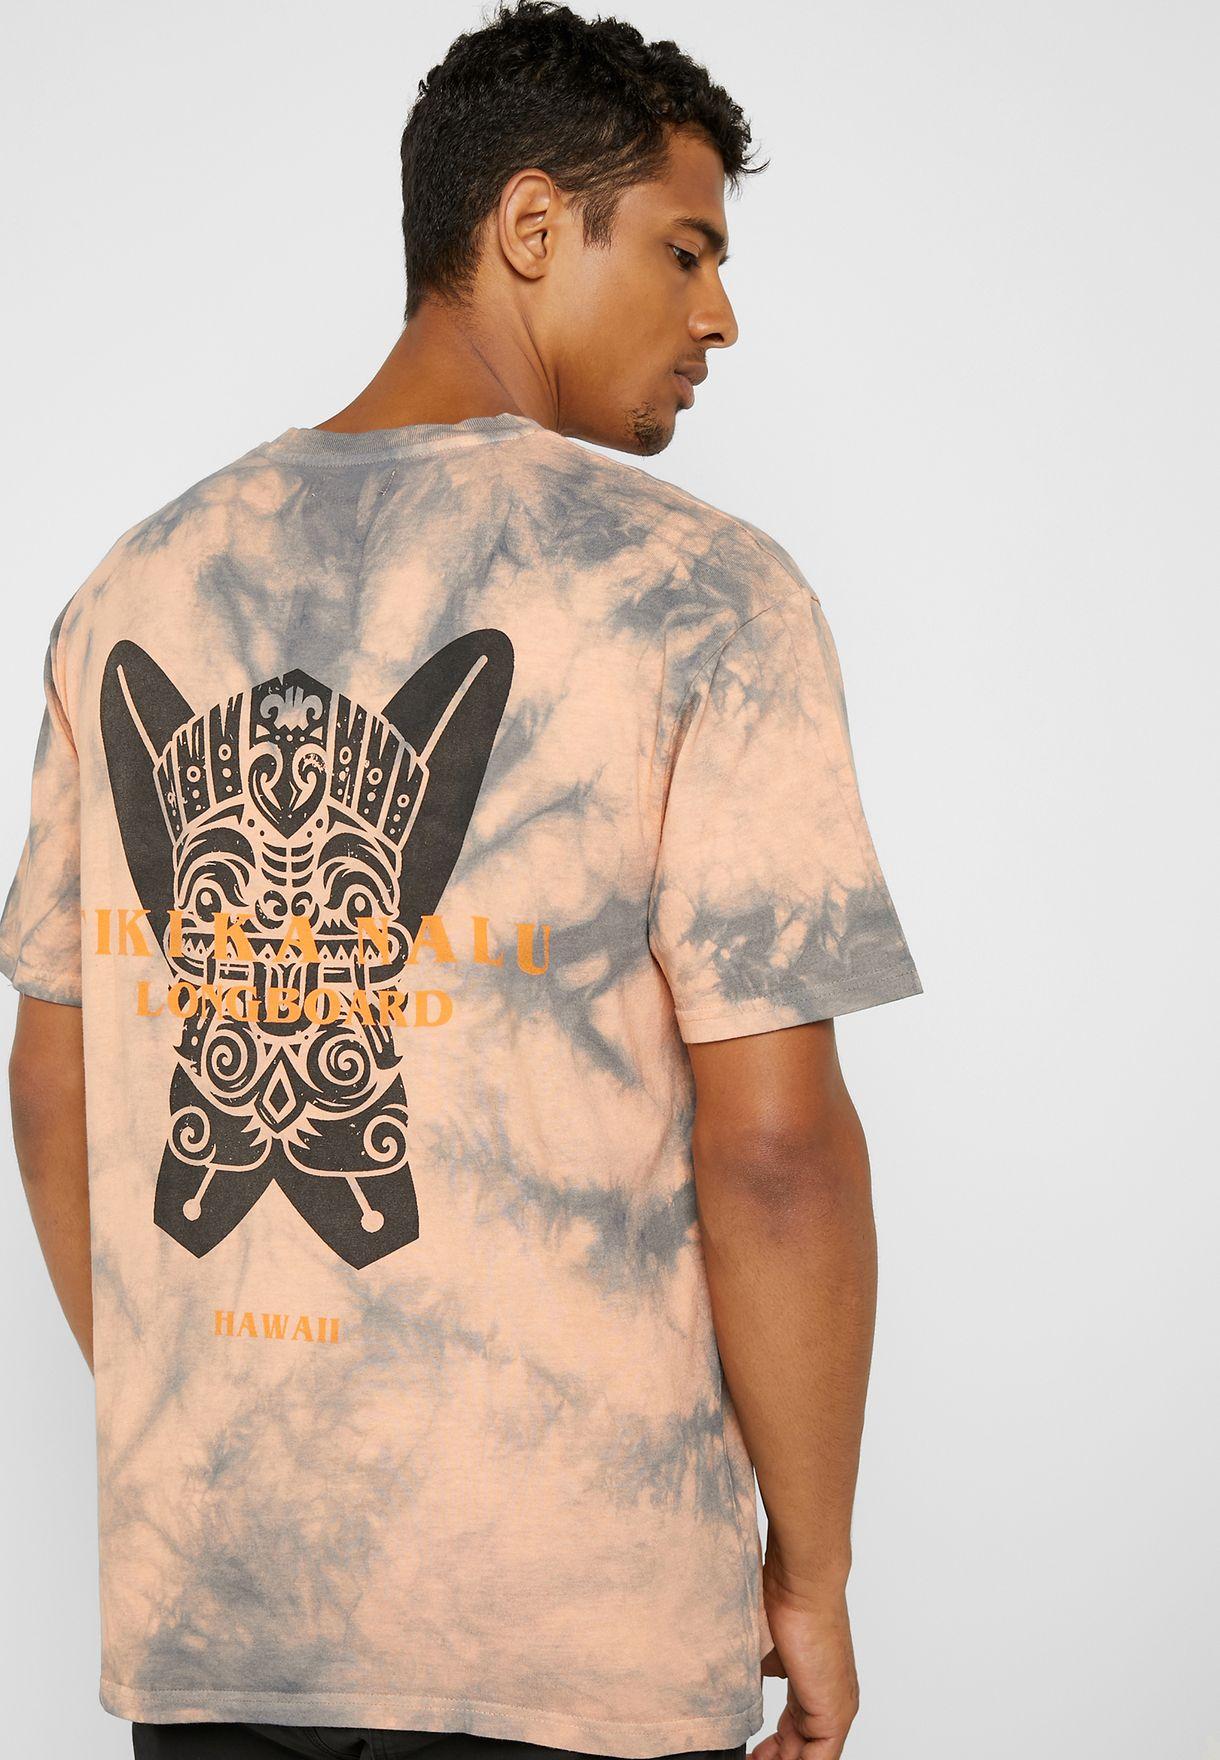 2e4cdd29 Shop Topman prints Oversized Tribal Tie Dye T-Shirt 71G82TOGE for ...